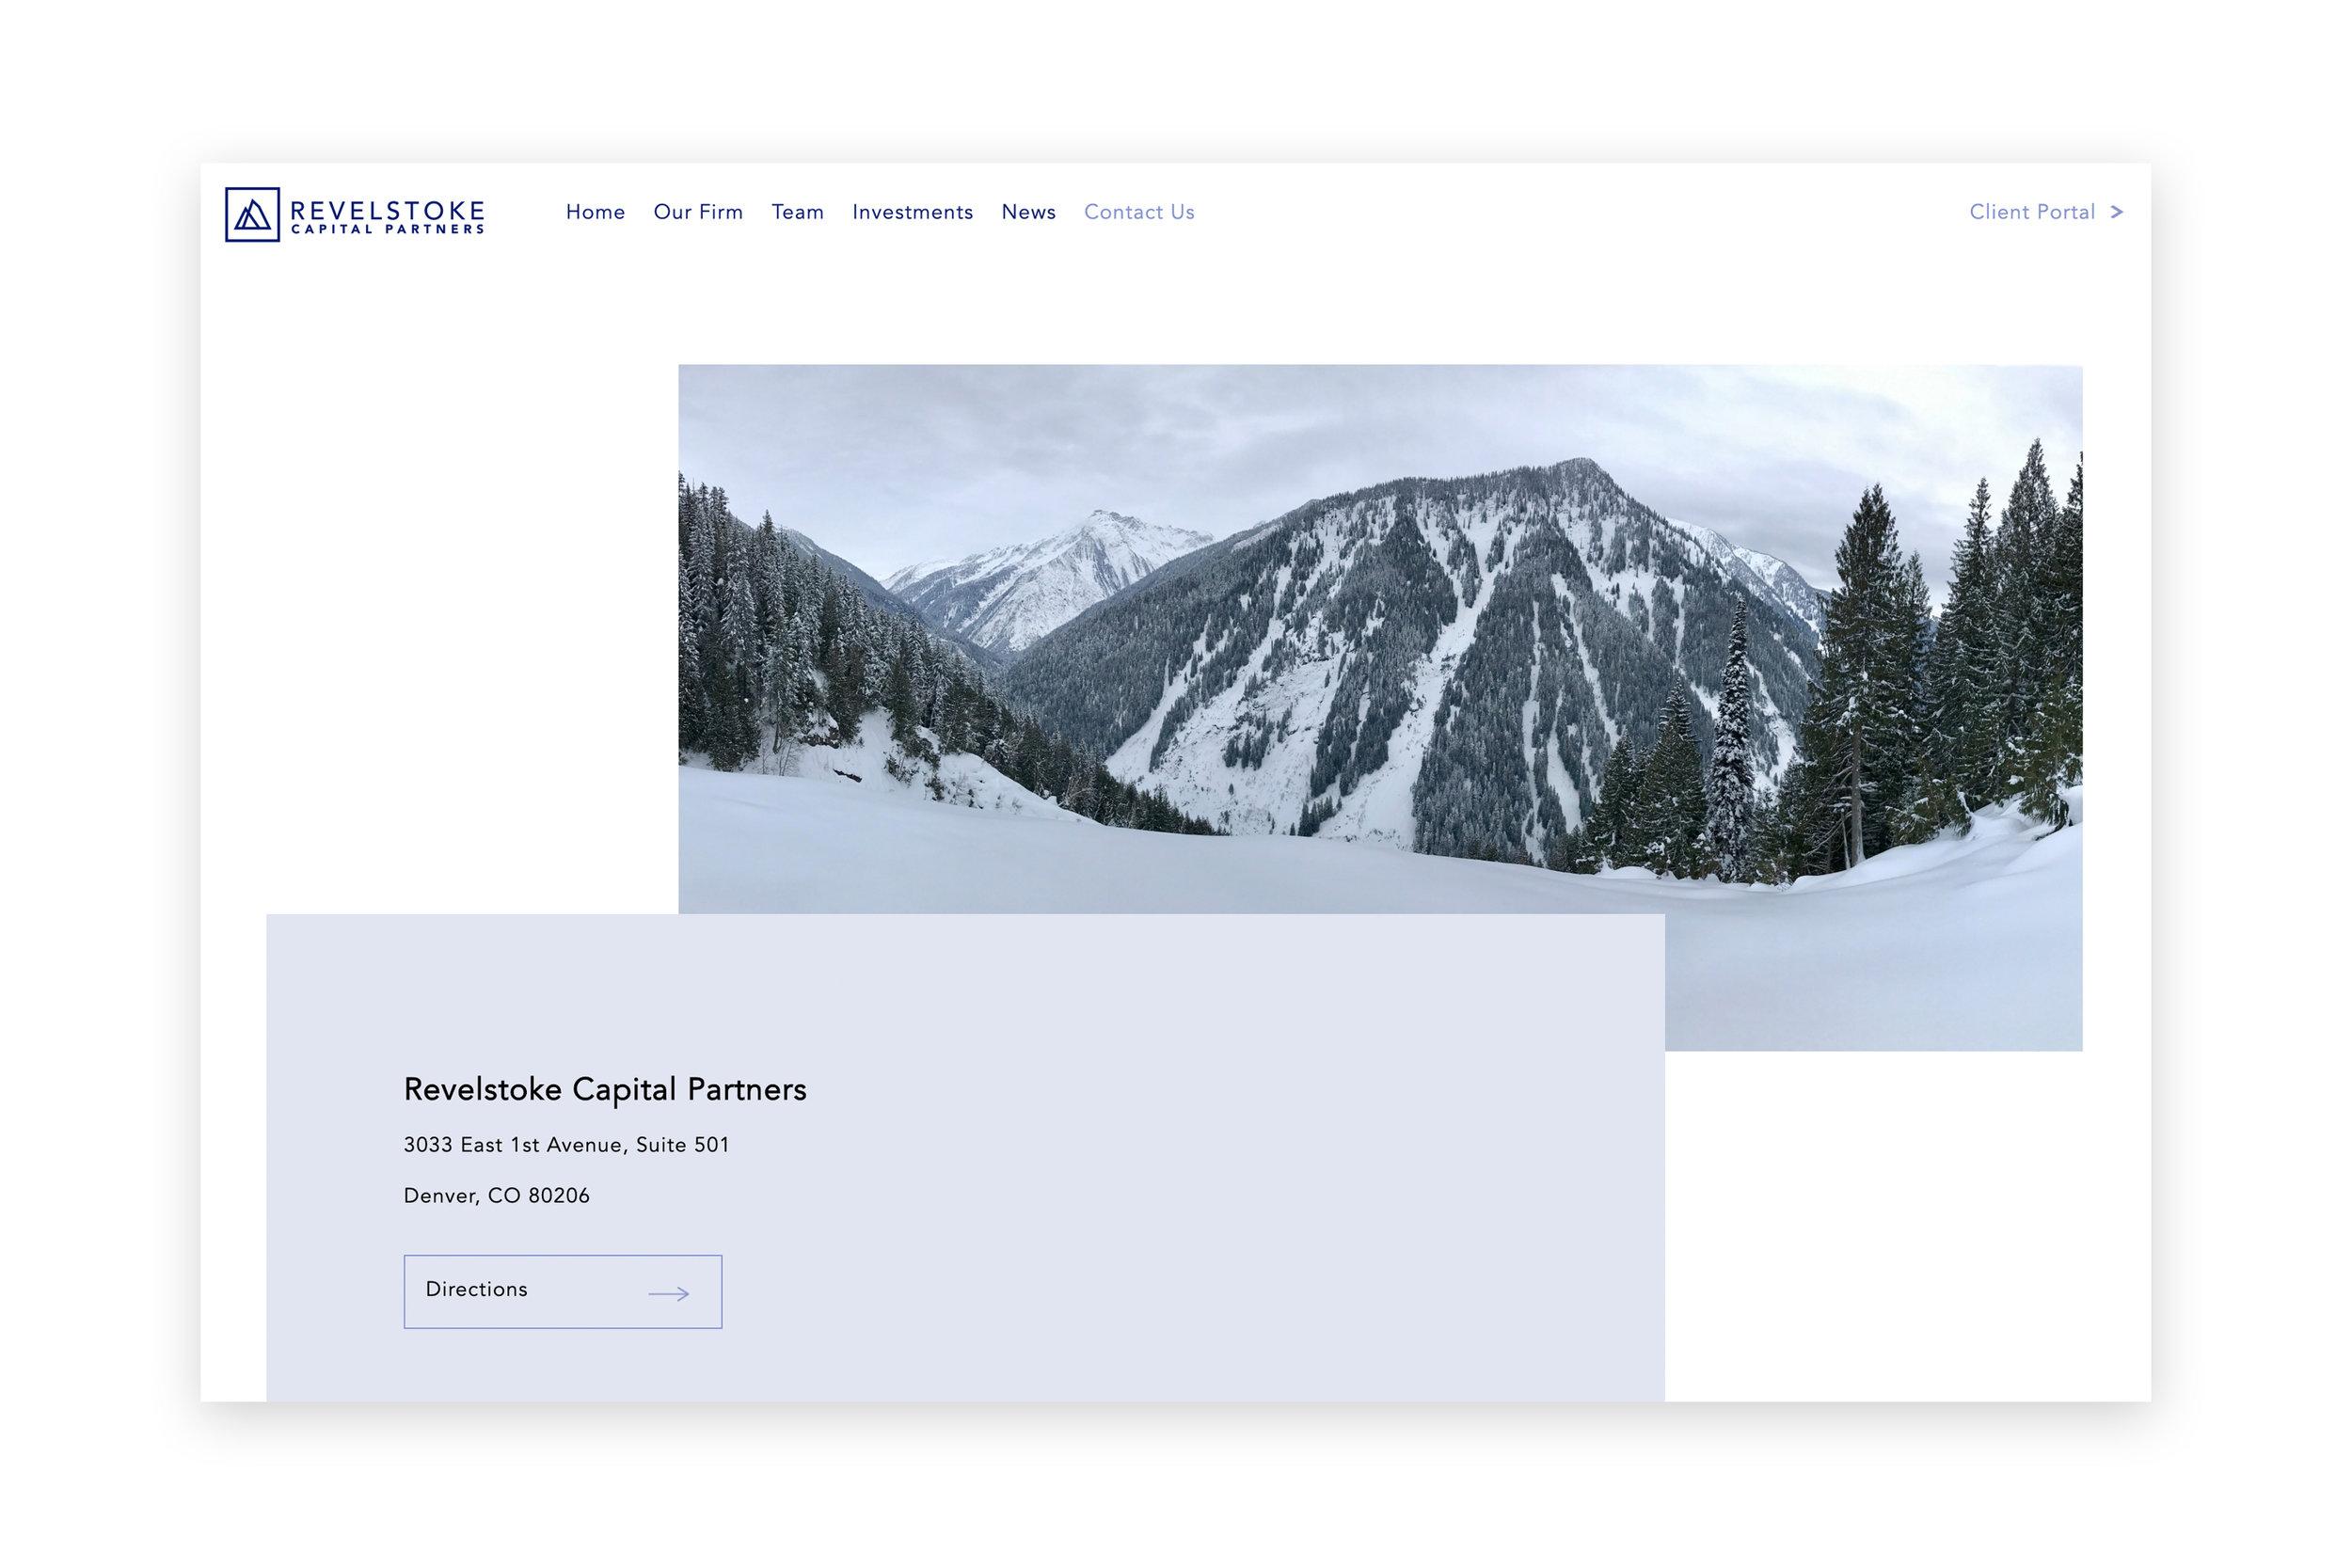 Revelstoke-screenshots-gallery5.jpg